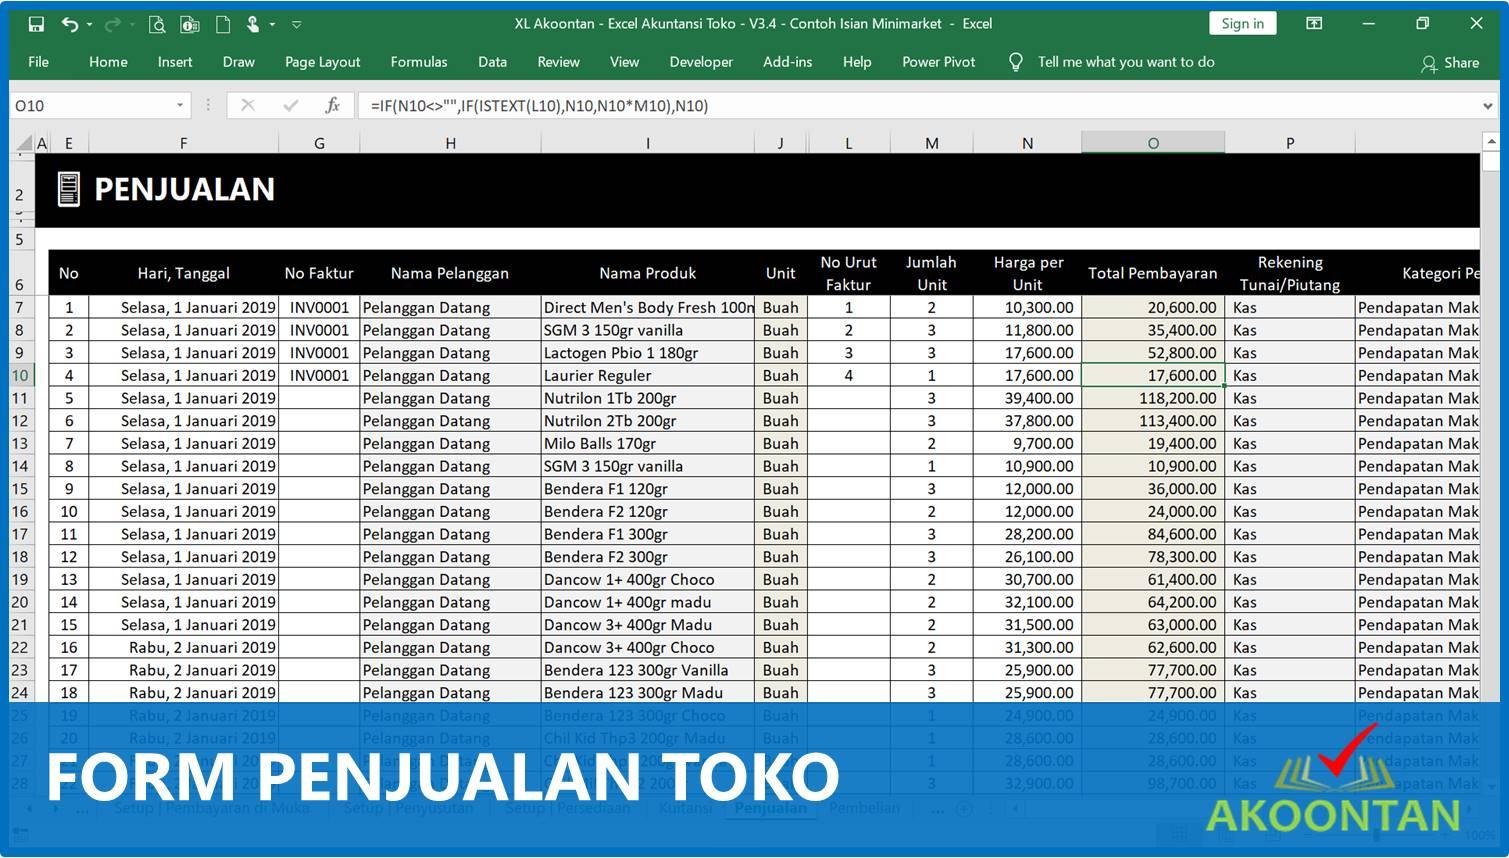 Form Penjualan Toko - Akuntansi-ID